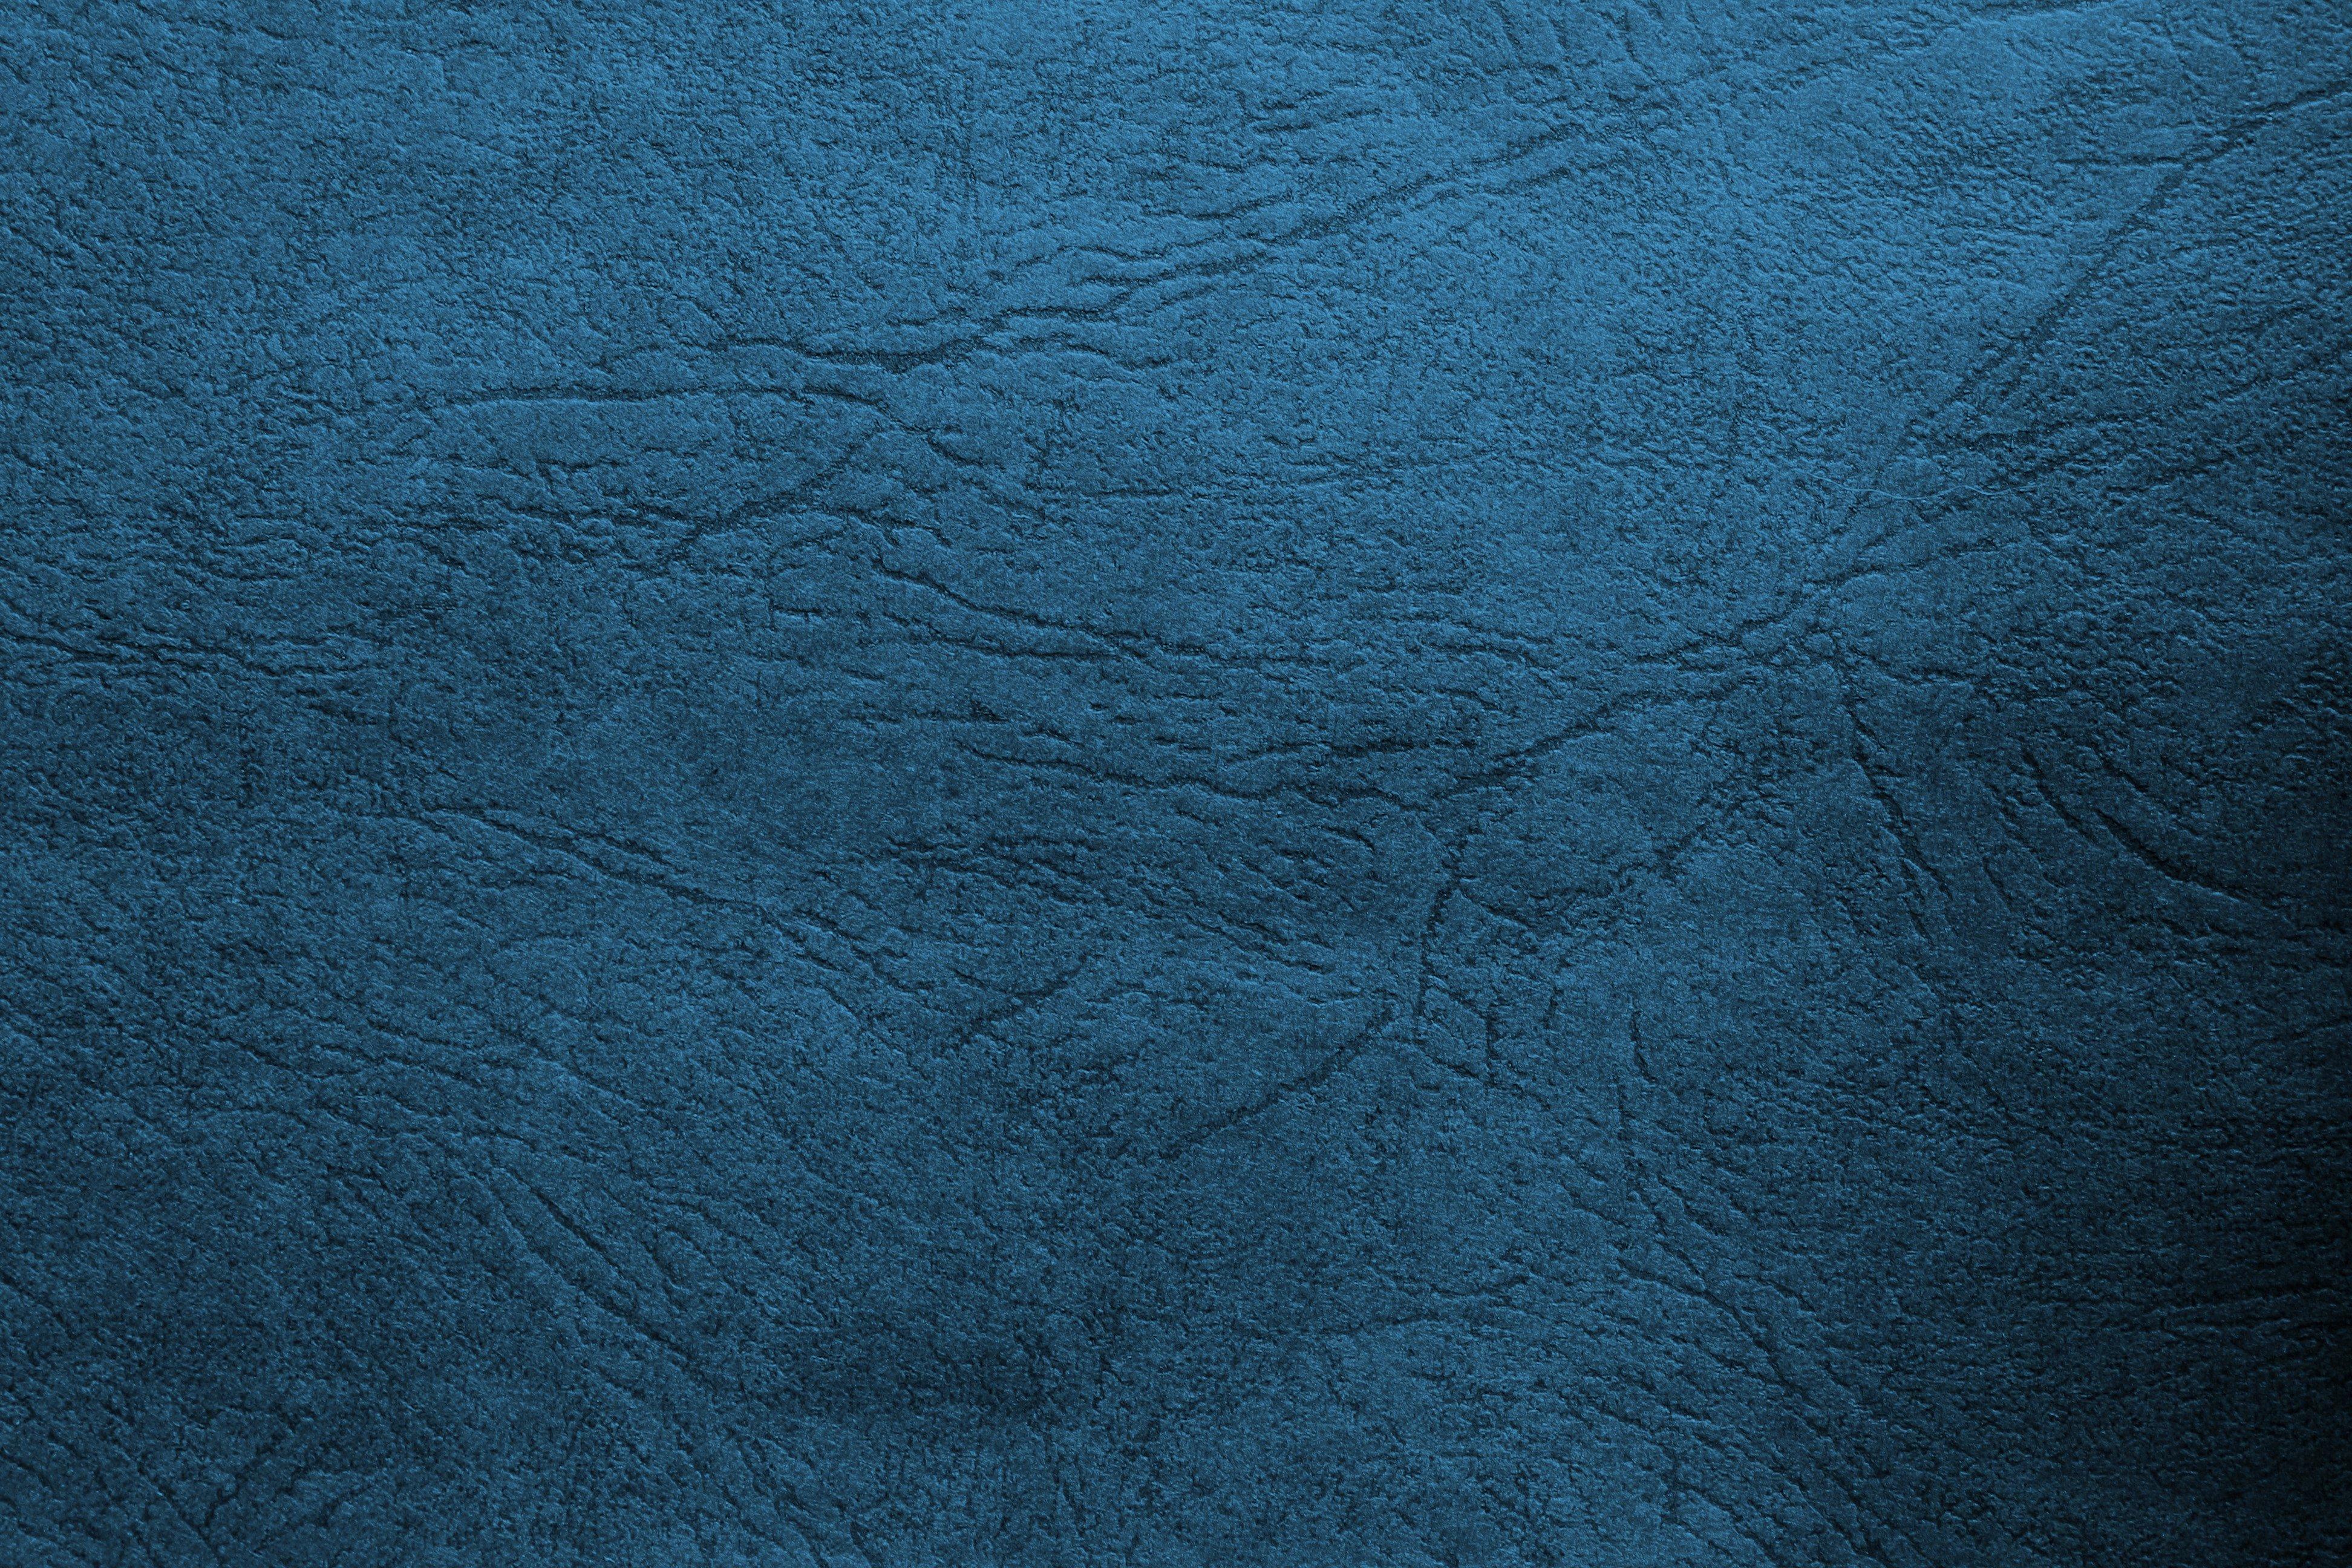 light blue leather background - photo #2